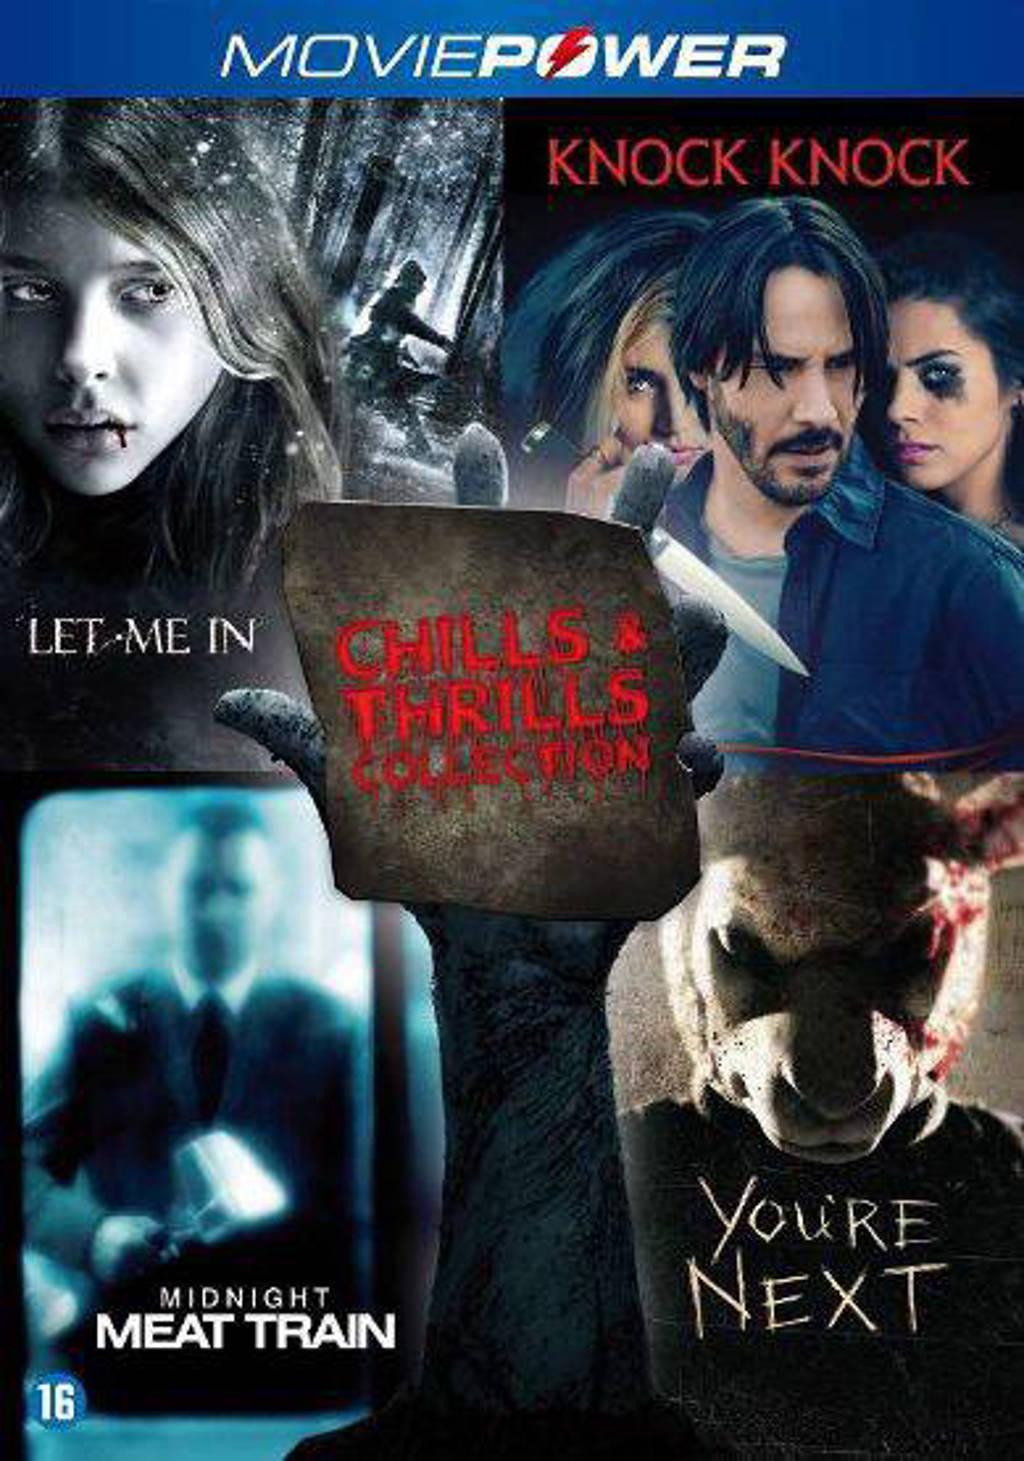 Chills & thrills collection 2 (Blu-ray)